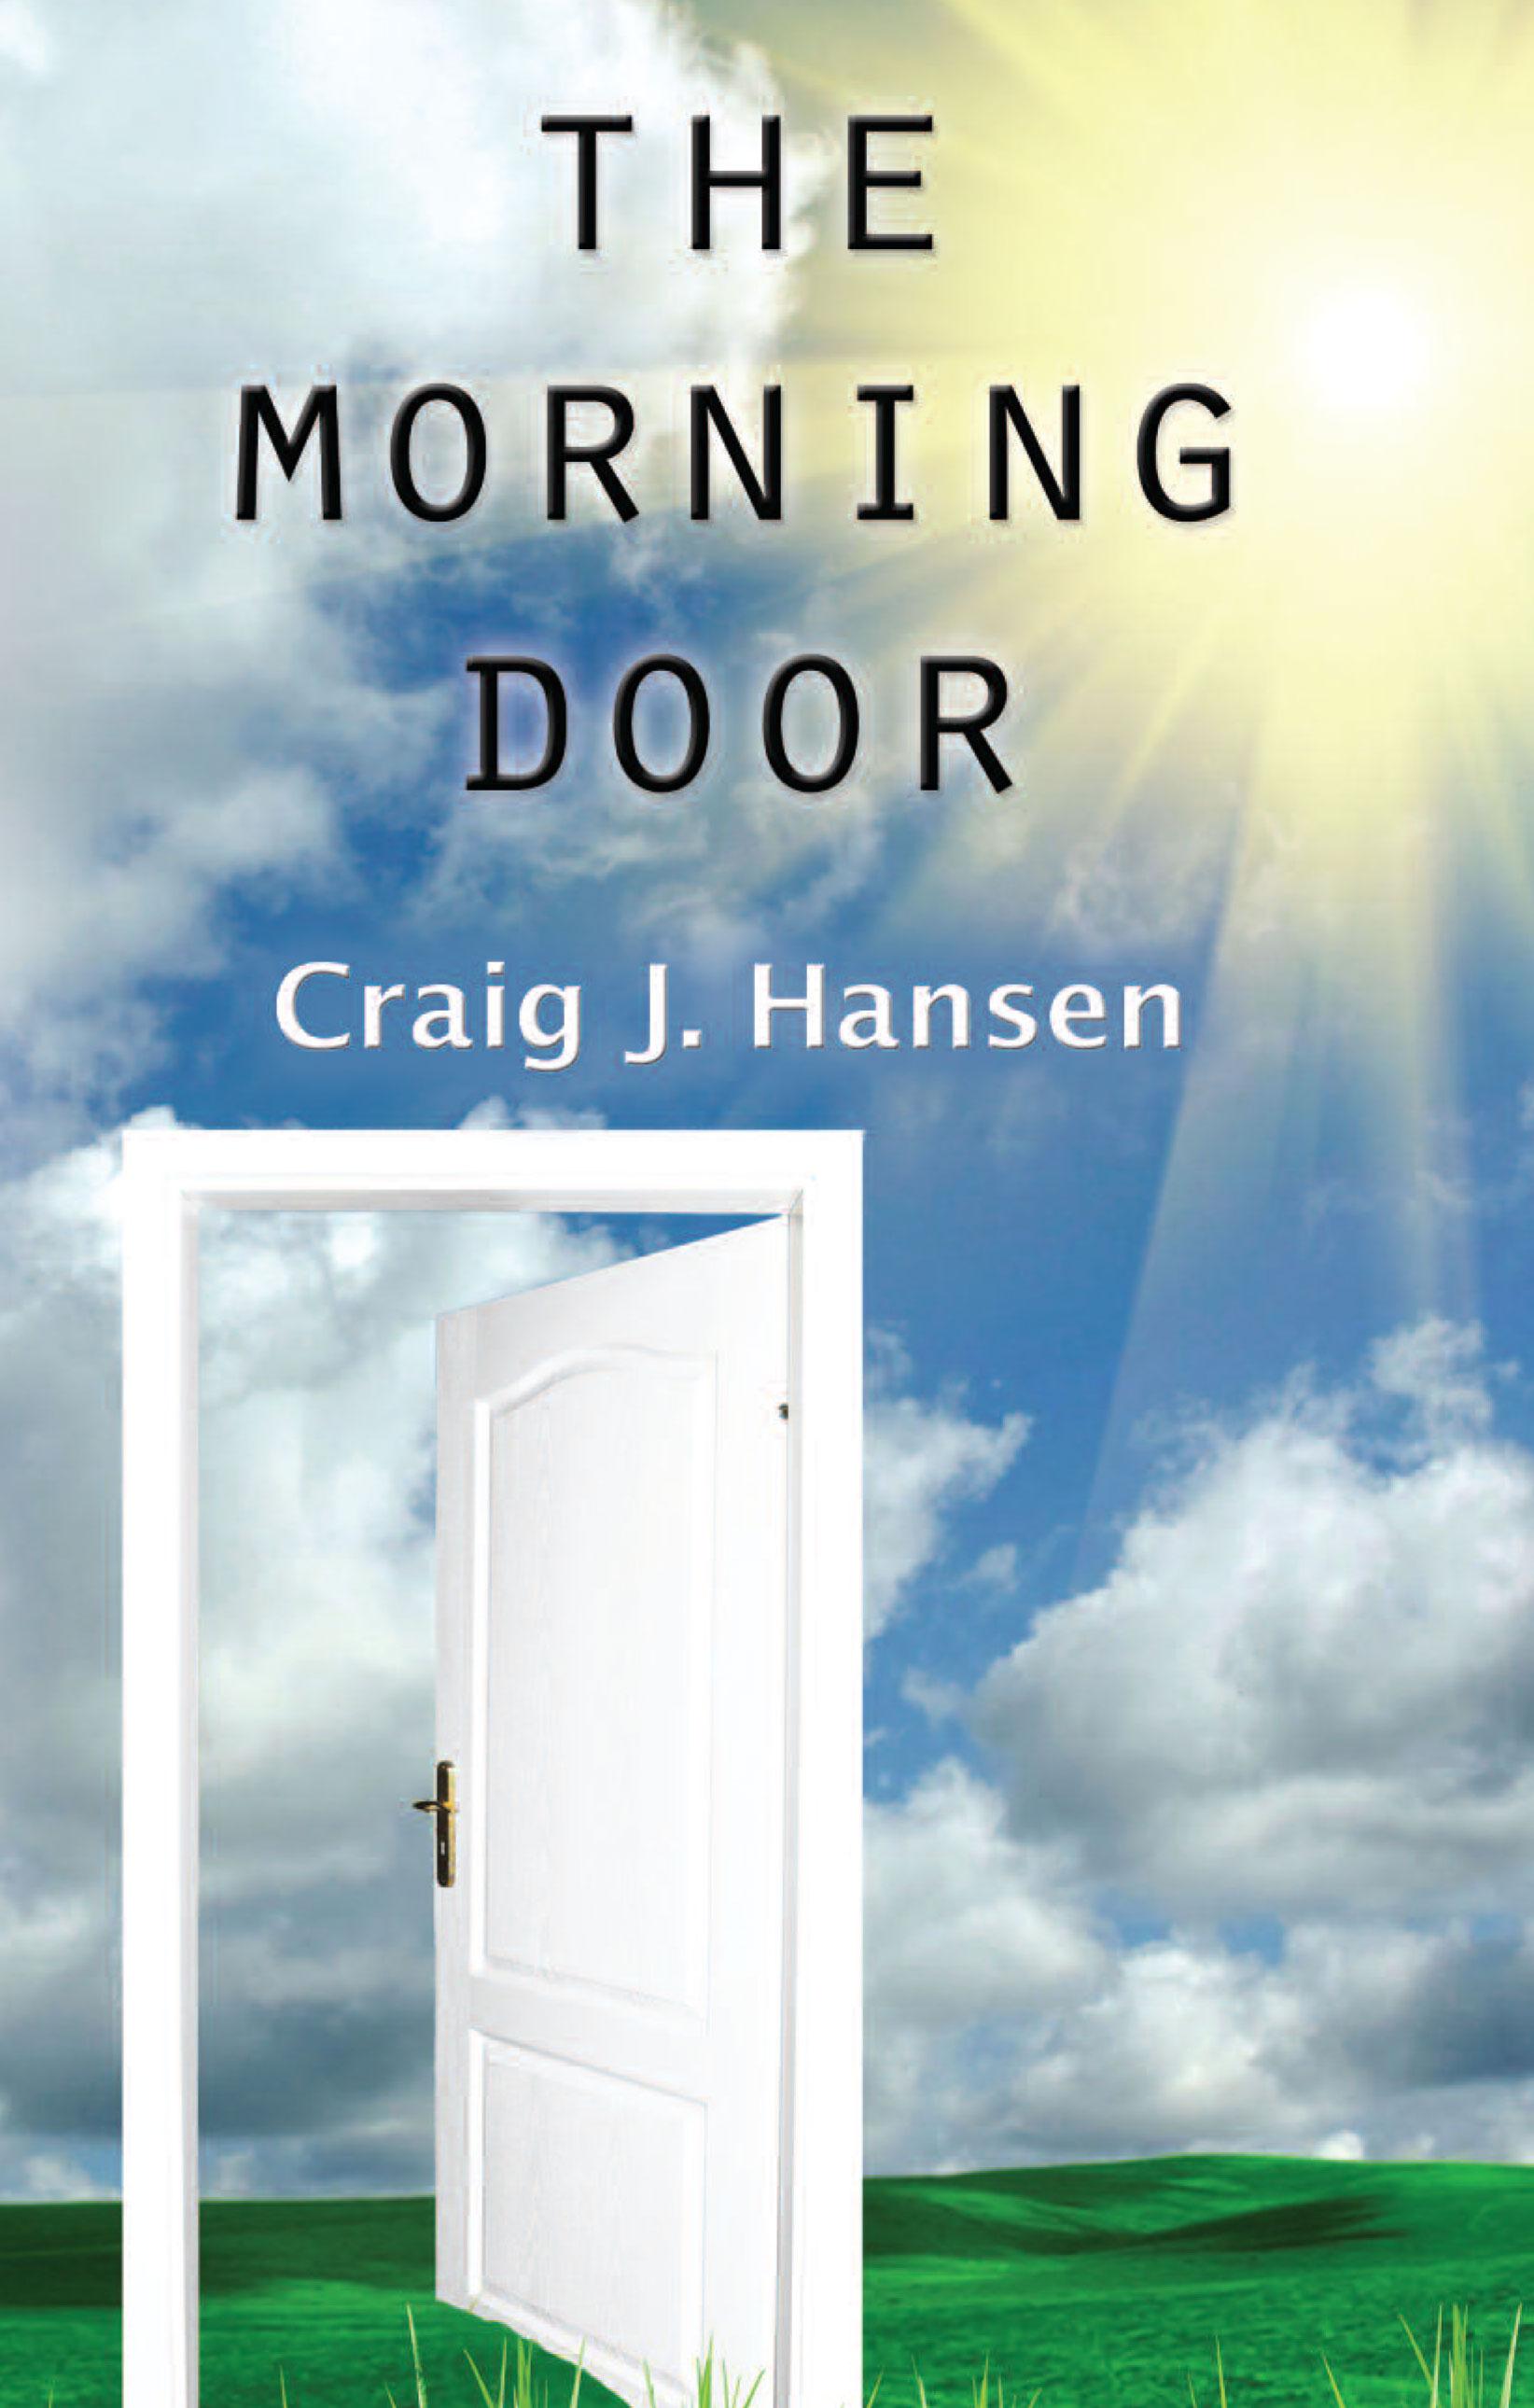 The Morning Door by Craig J. Hansen